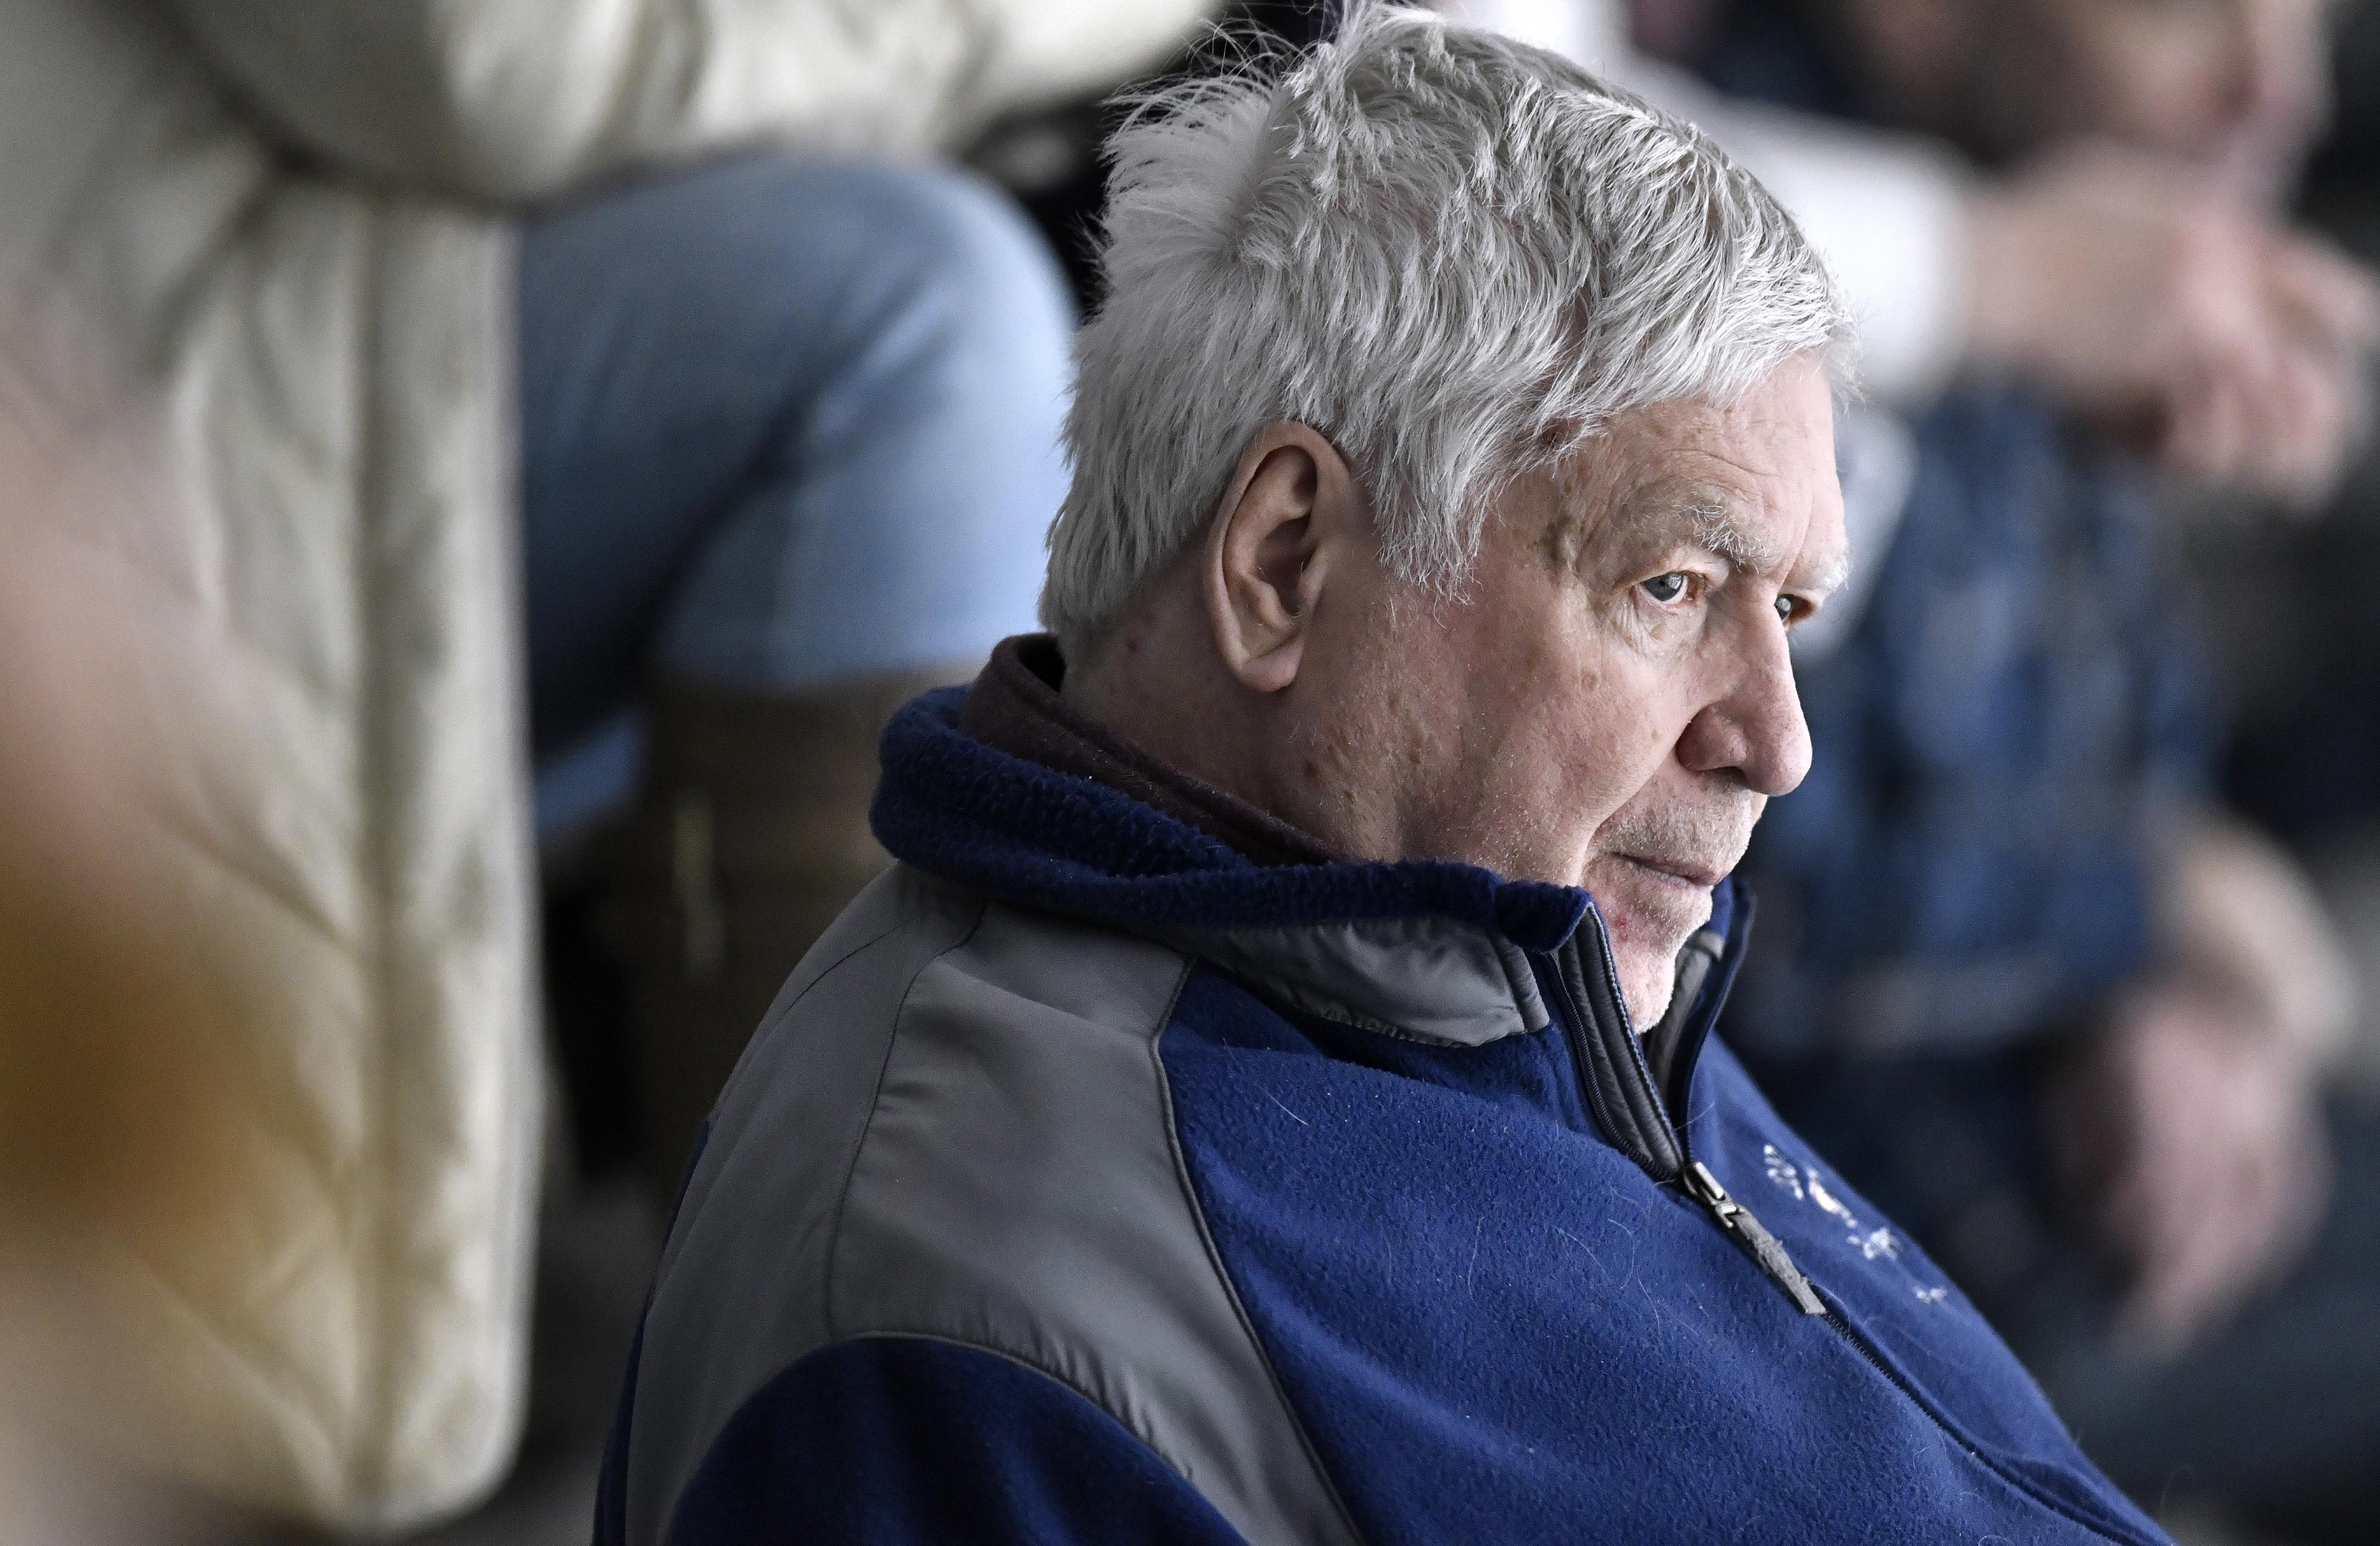 Carl Gray began the Assabet hockey program in 1972.